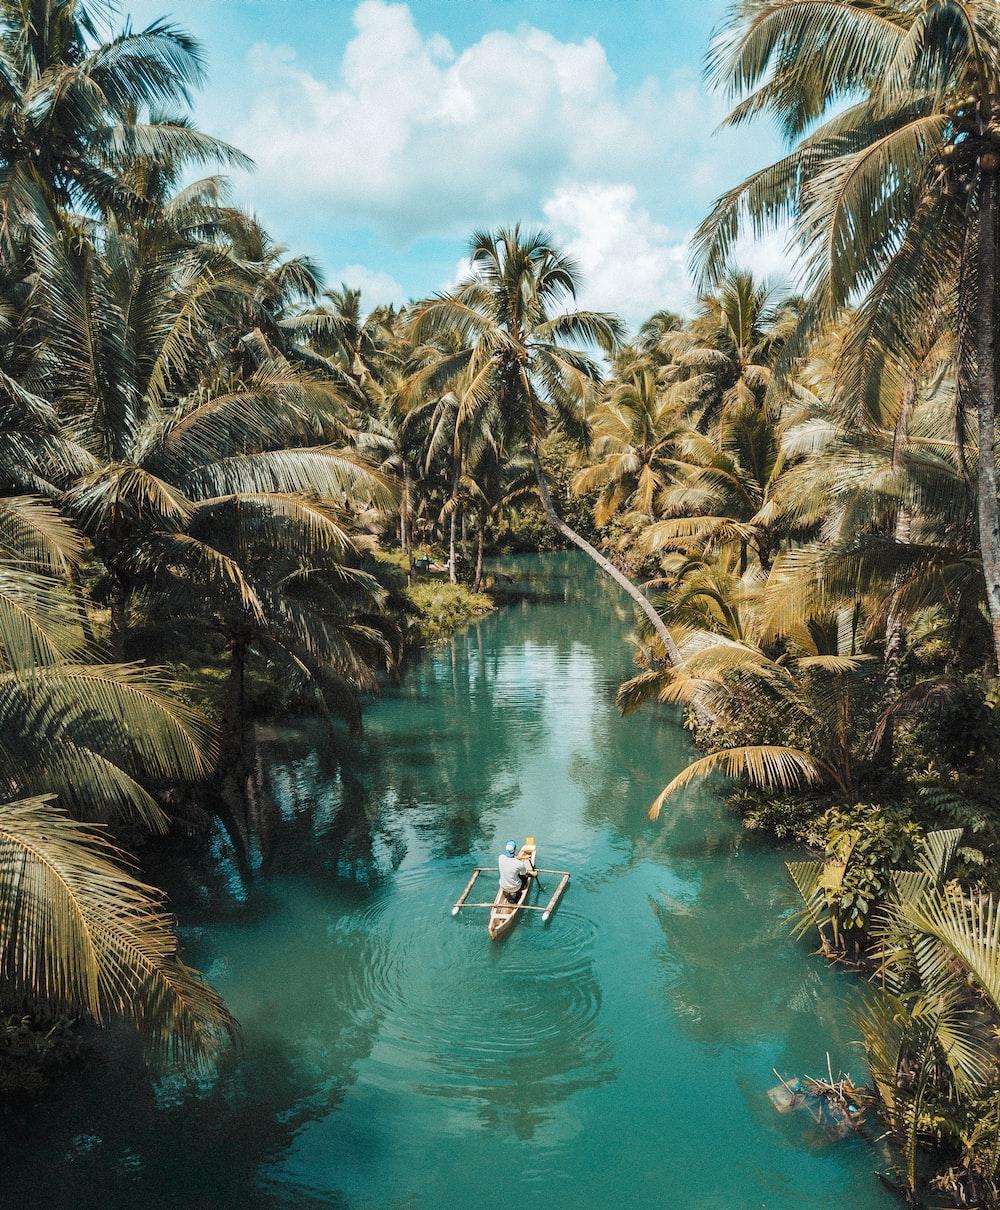 green palm tress